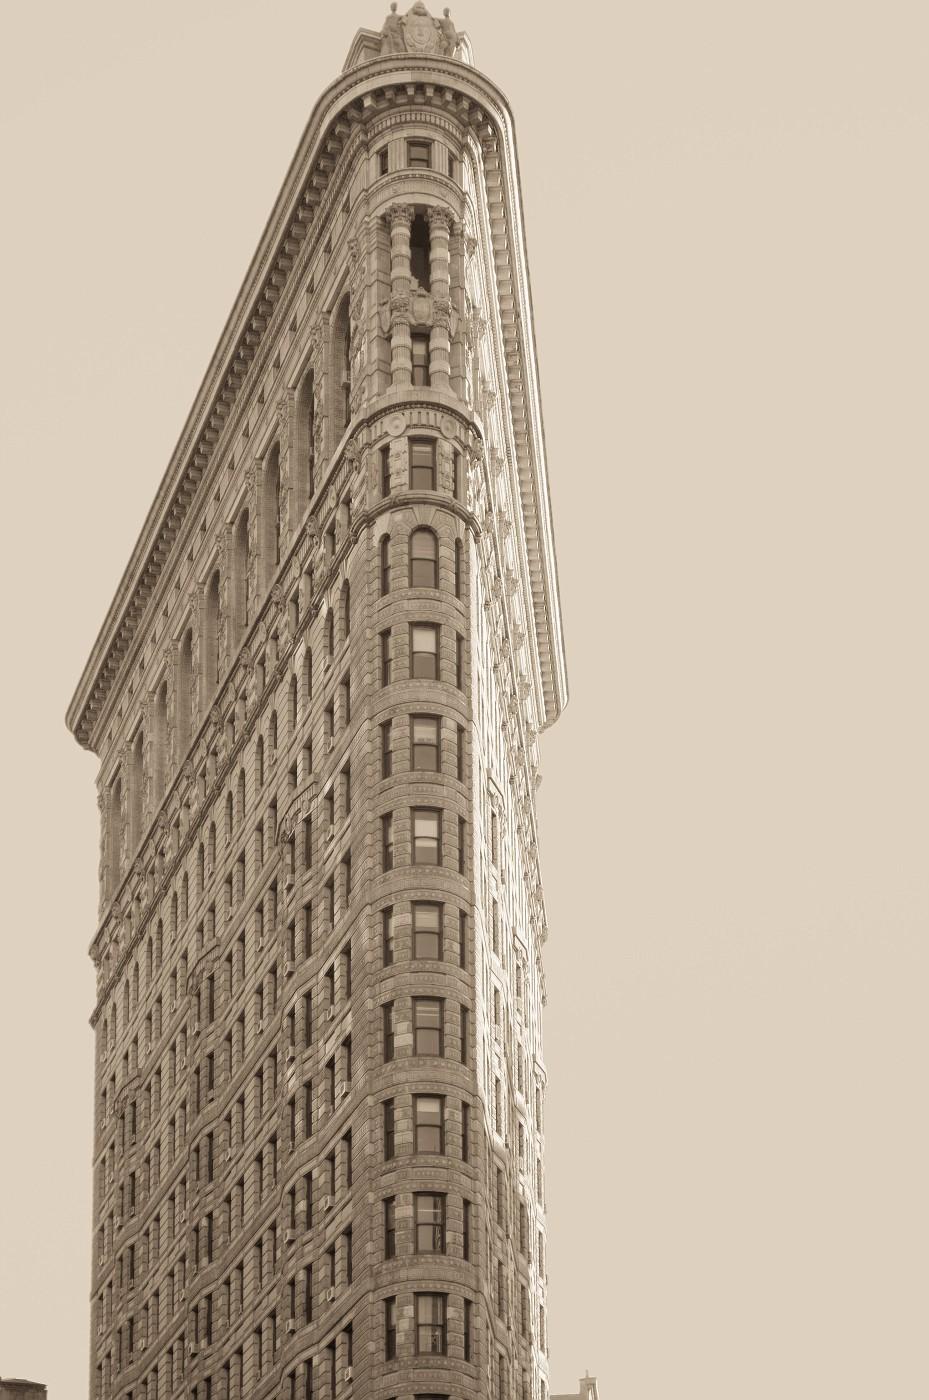 Flatiron Building, New York, NY